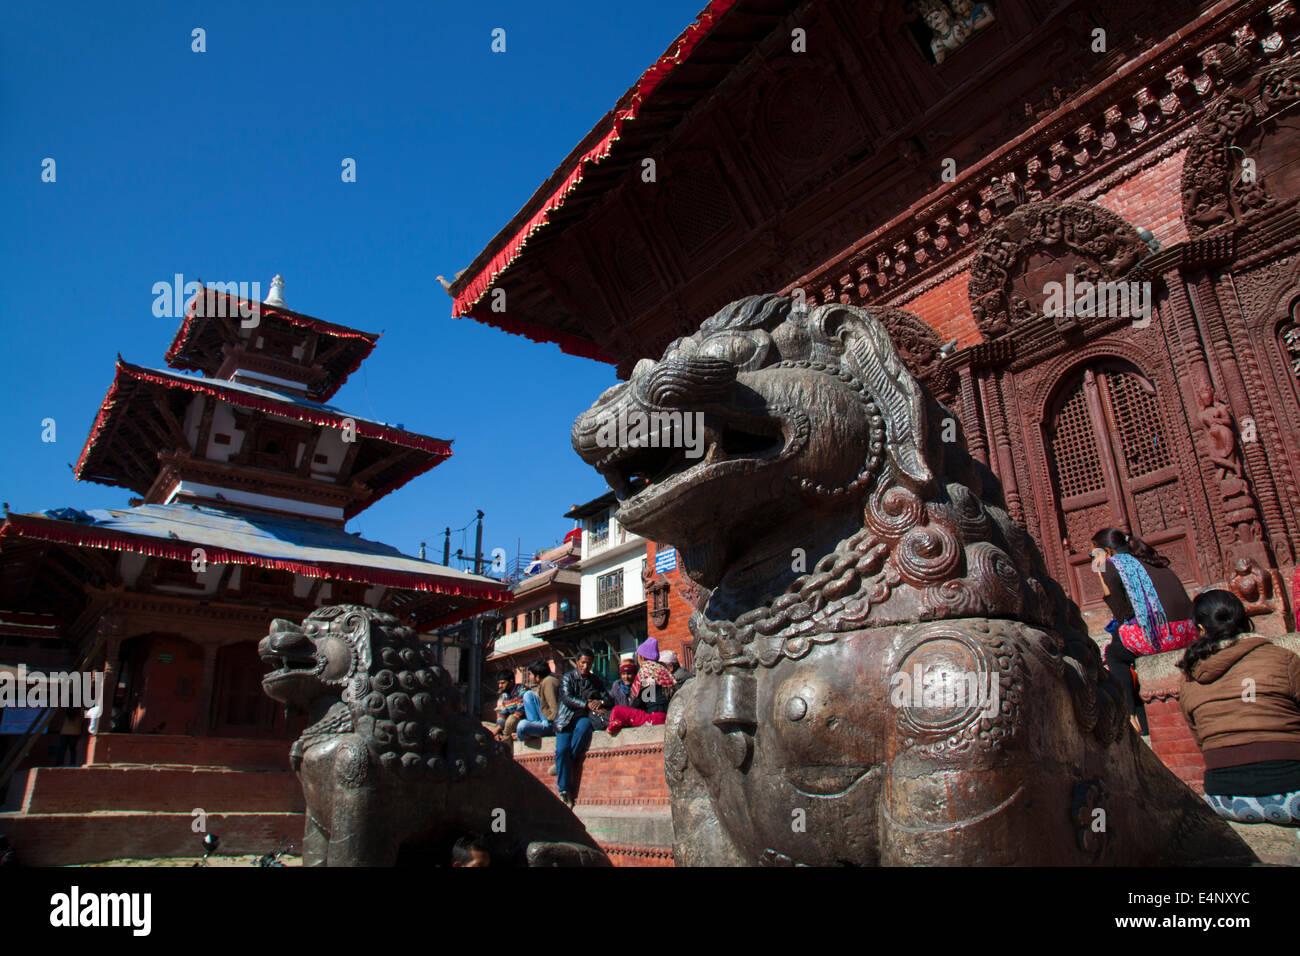 Pagodas at Durbar Square, Kathmandu, Nepal - Stock Image